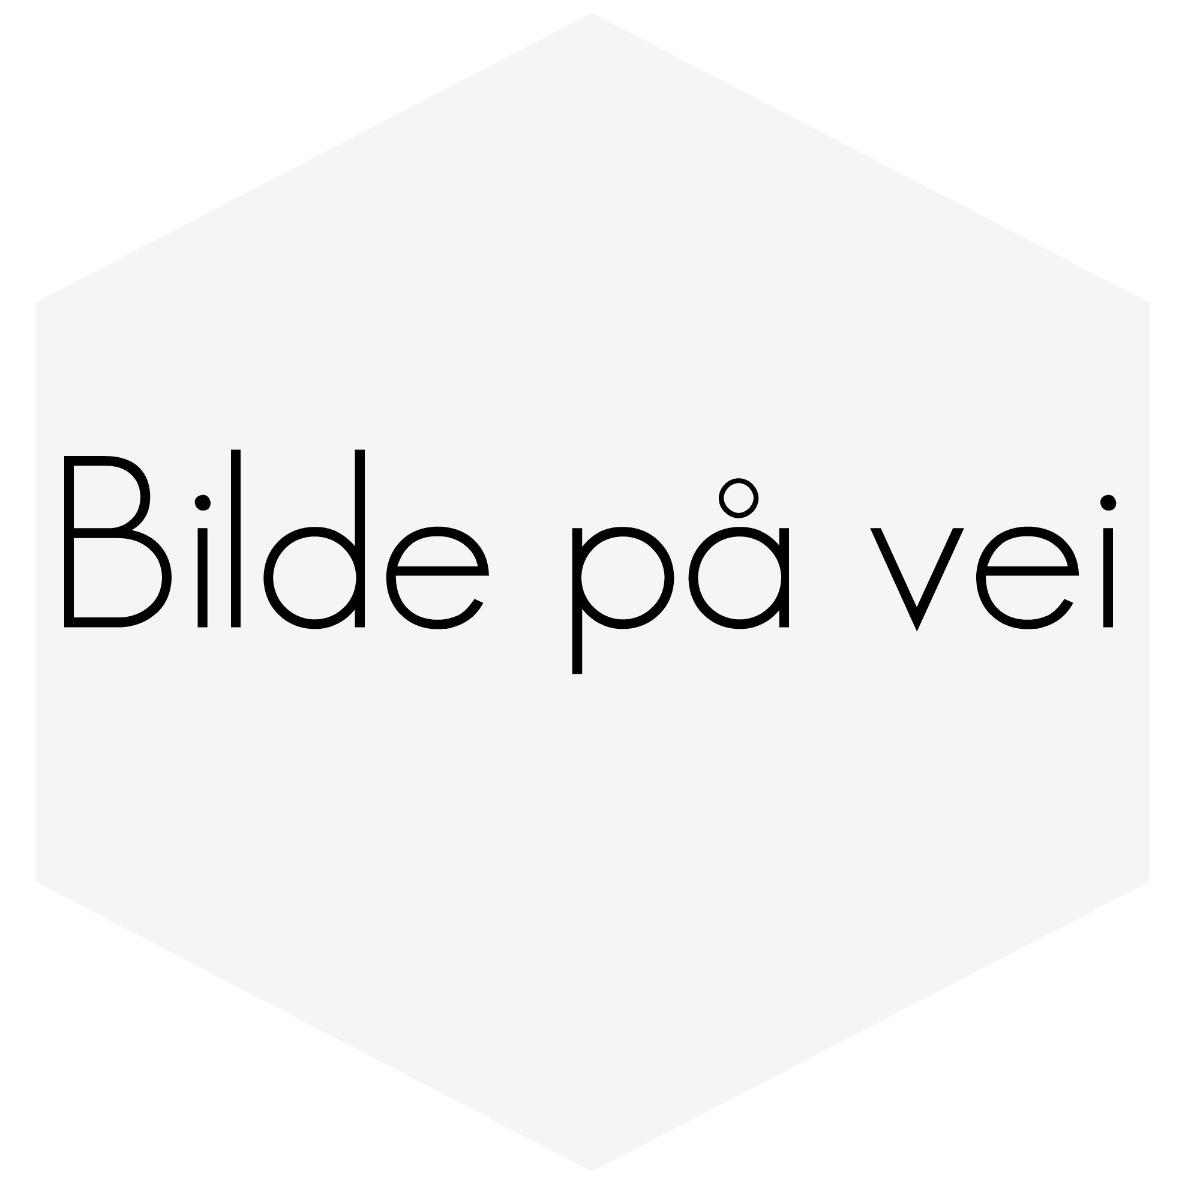 FORING SUPERFLEX 700/900 BAKAKSEL SATS MED STORE PÅ MOMENTSG